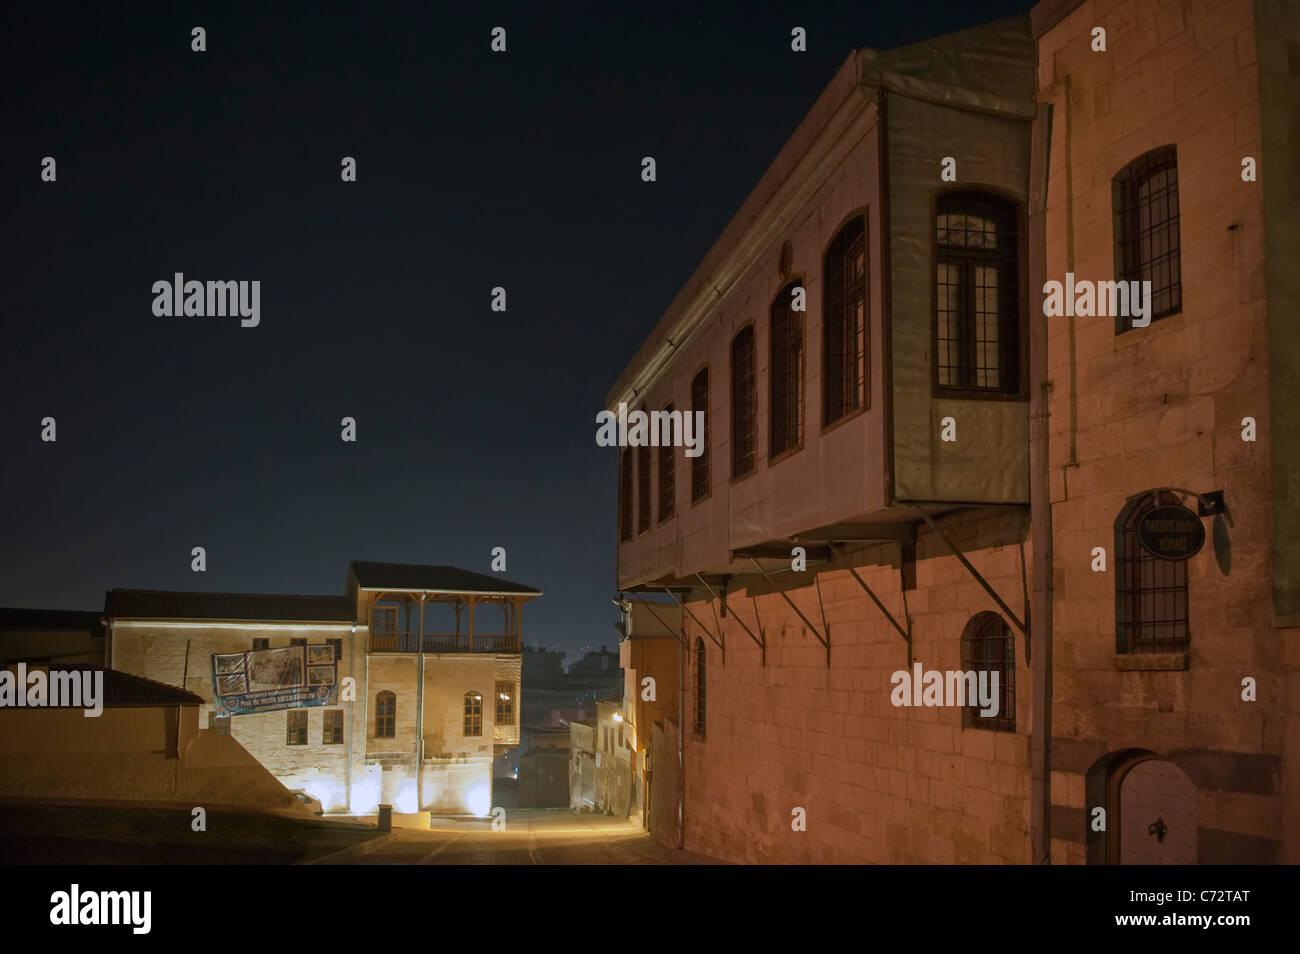 Arquitectura histórica de Gaziantep Turquía Imagen De Stock